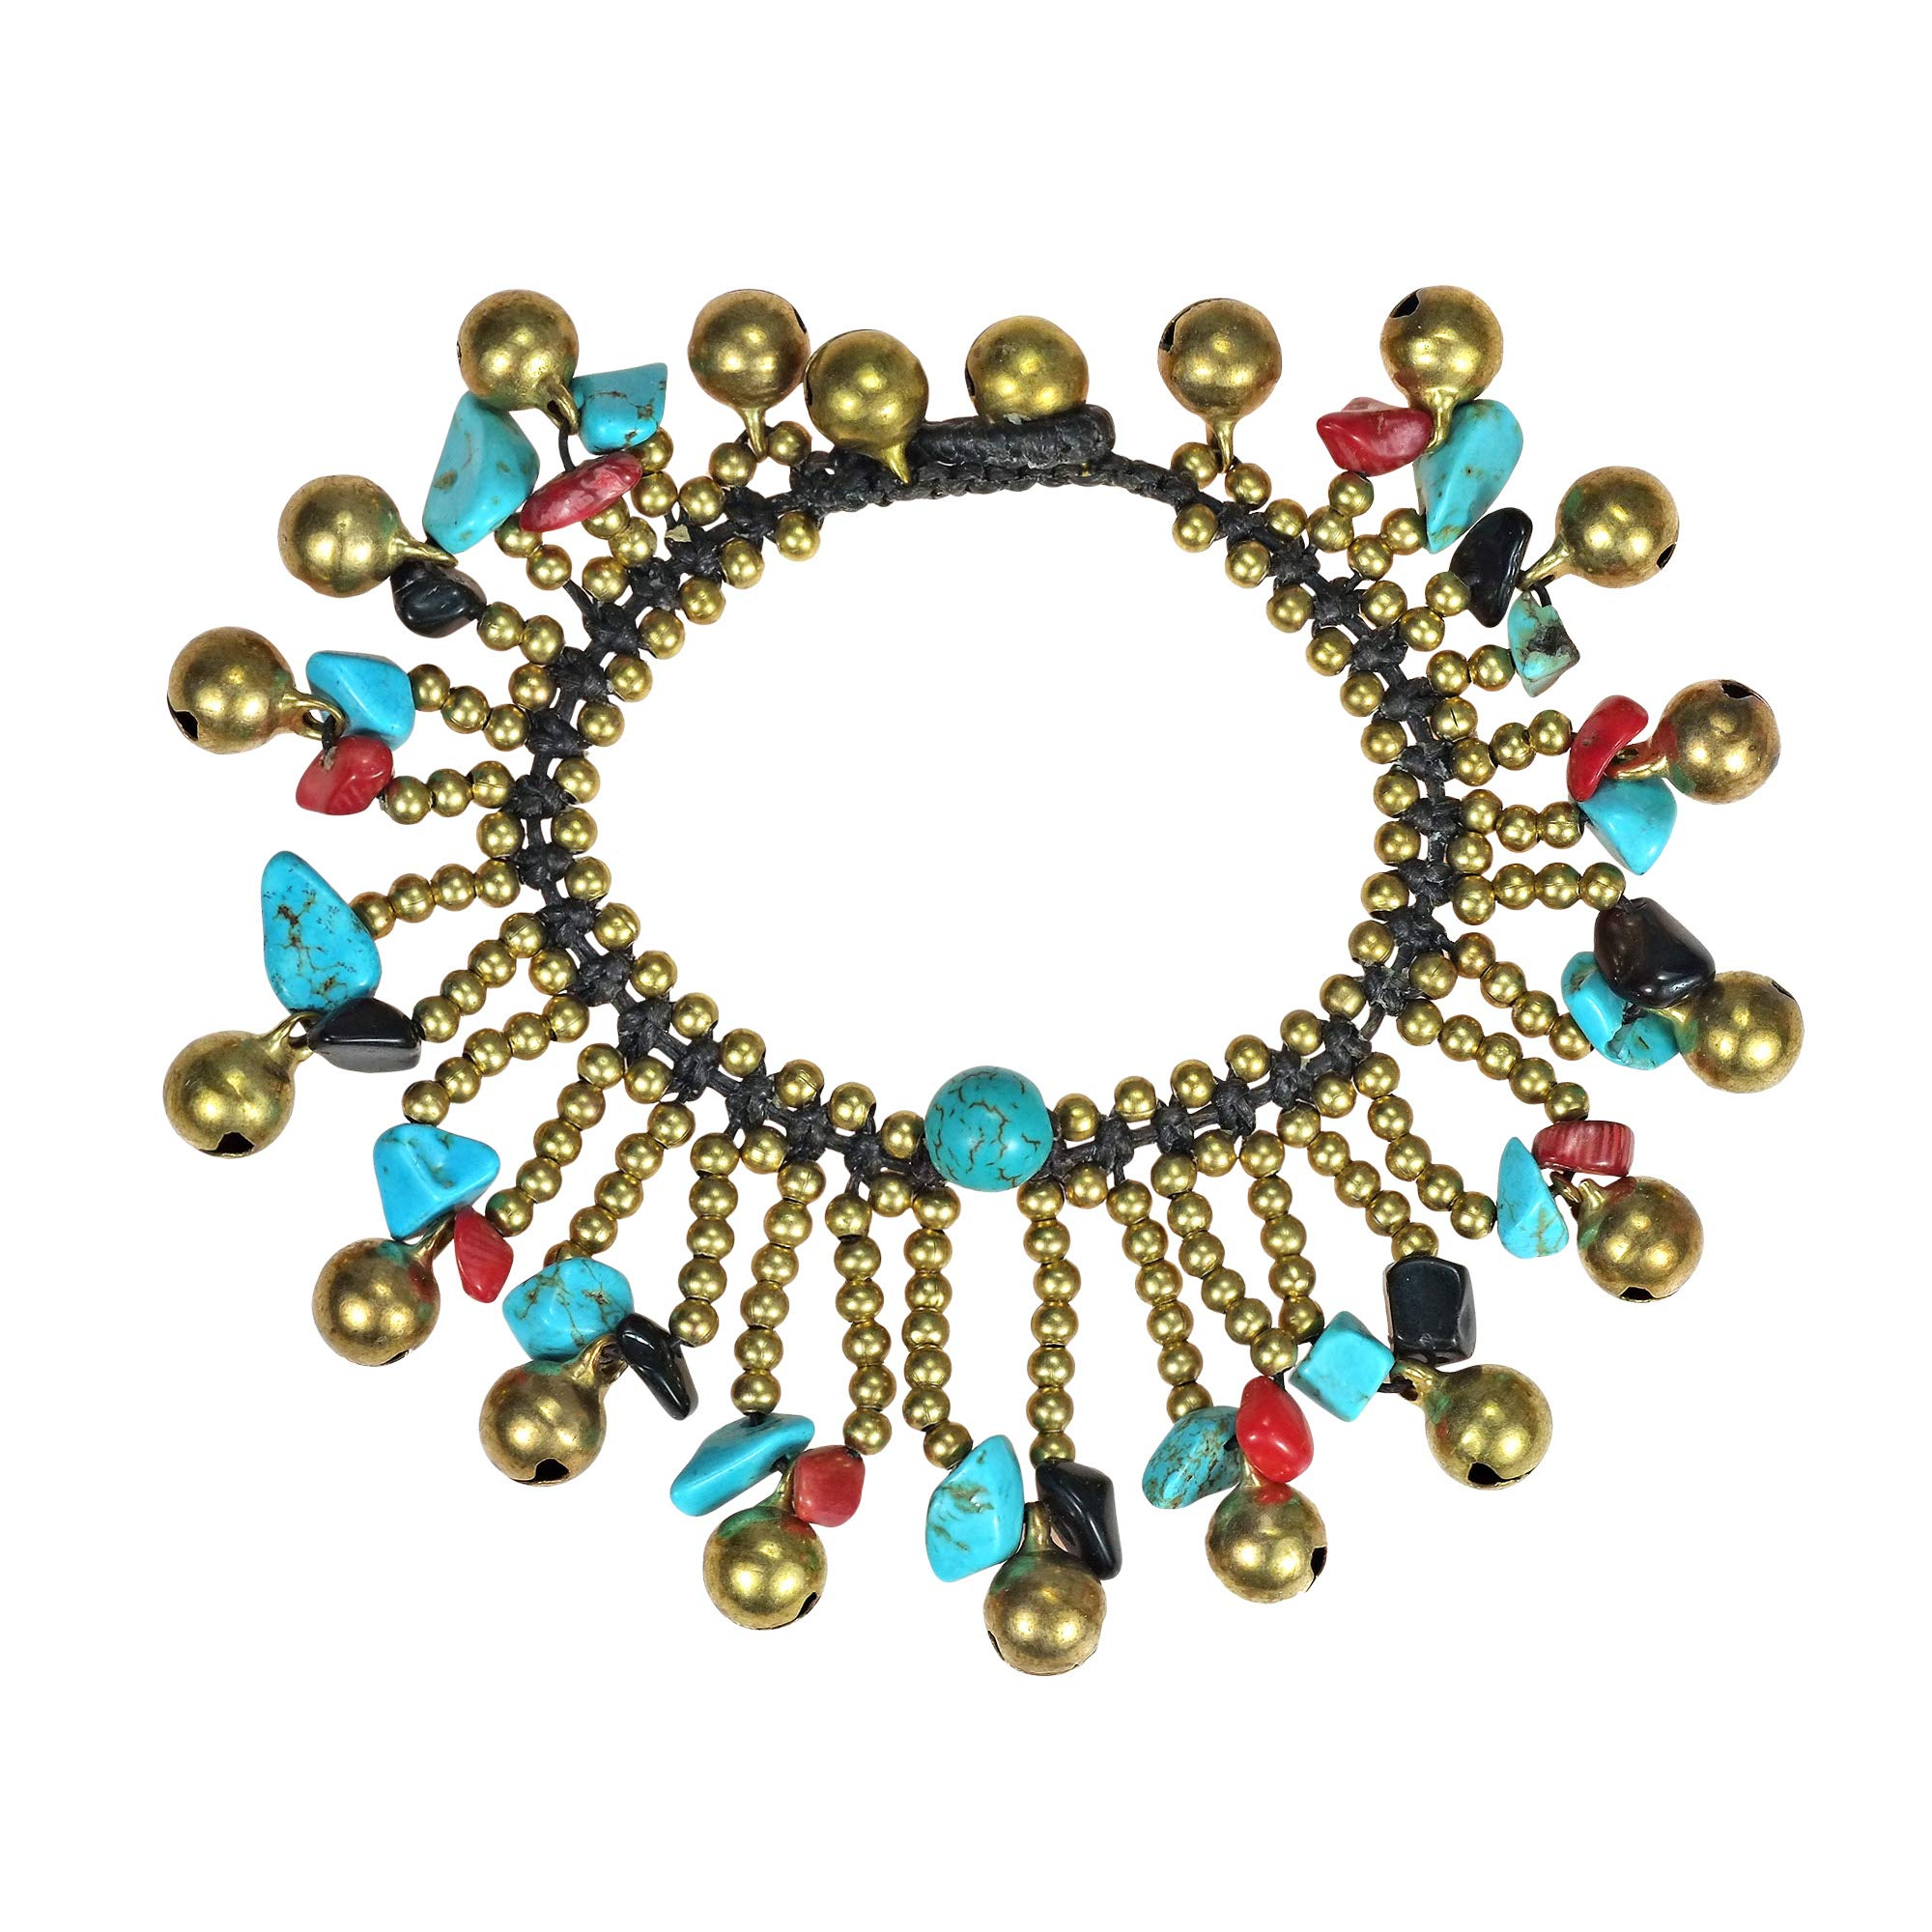 AeraVida Tribal Dancer Mixed Material Jingle Bell Link Bracelet